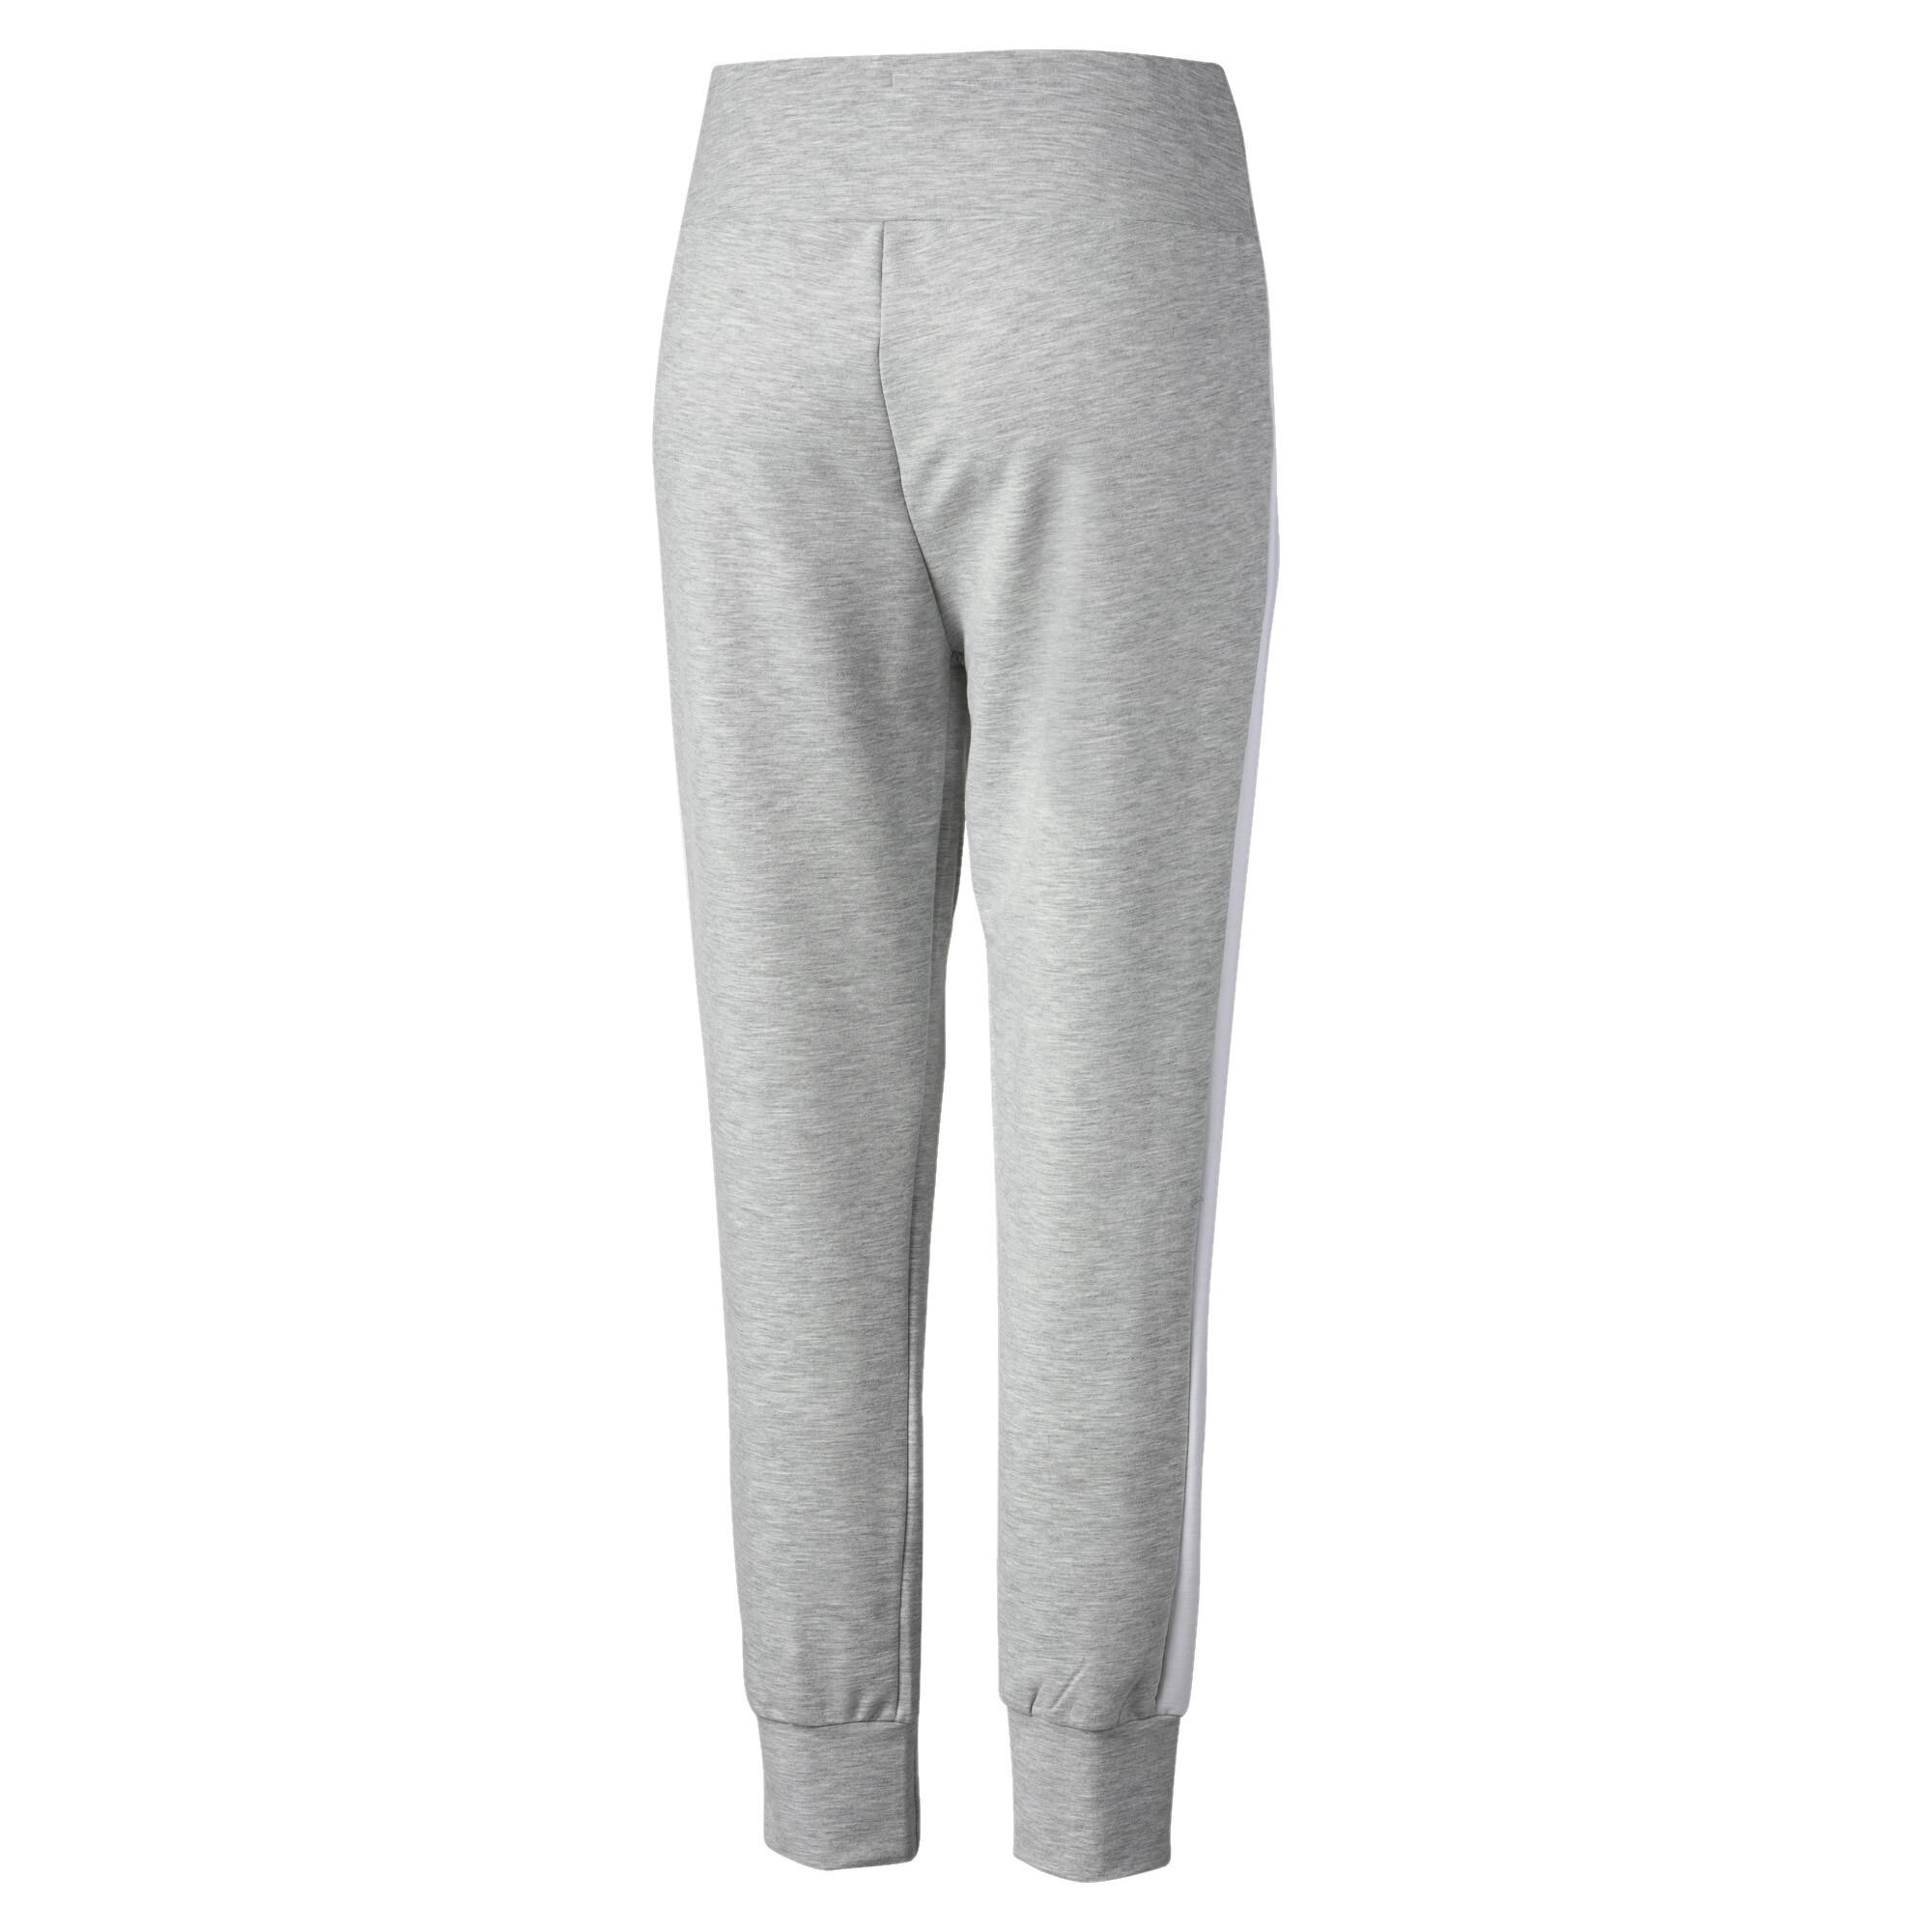 PUMA-Modern-Sports-Women-039-s-Track-Pants-Women-Knitted-Pants-Basics thumbnail 8